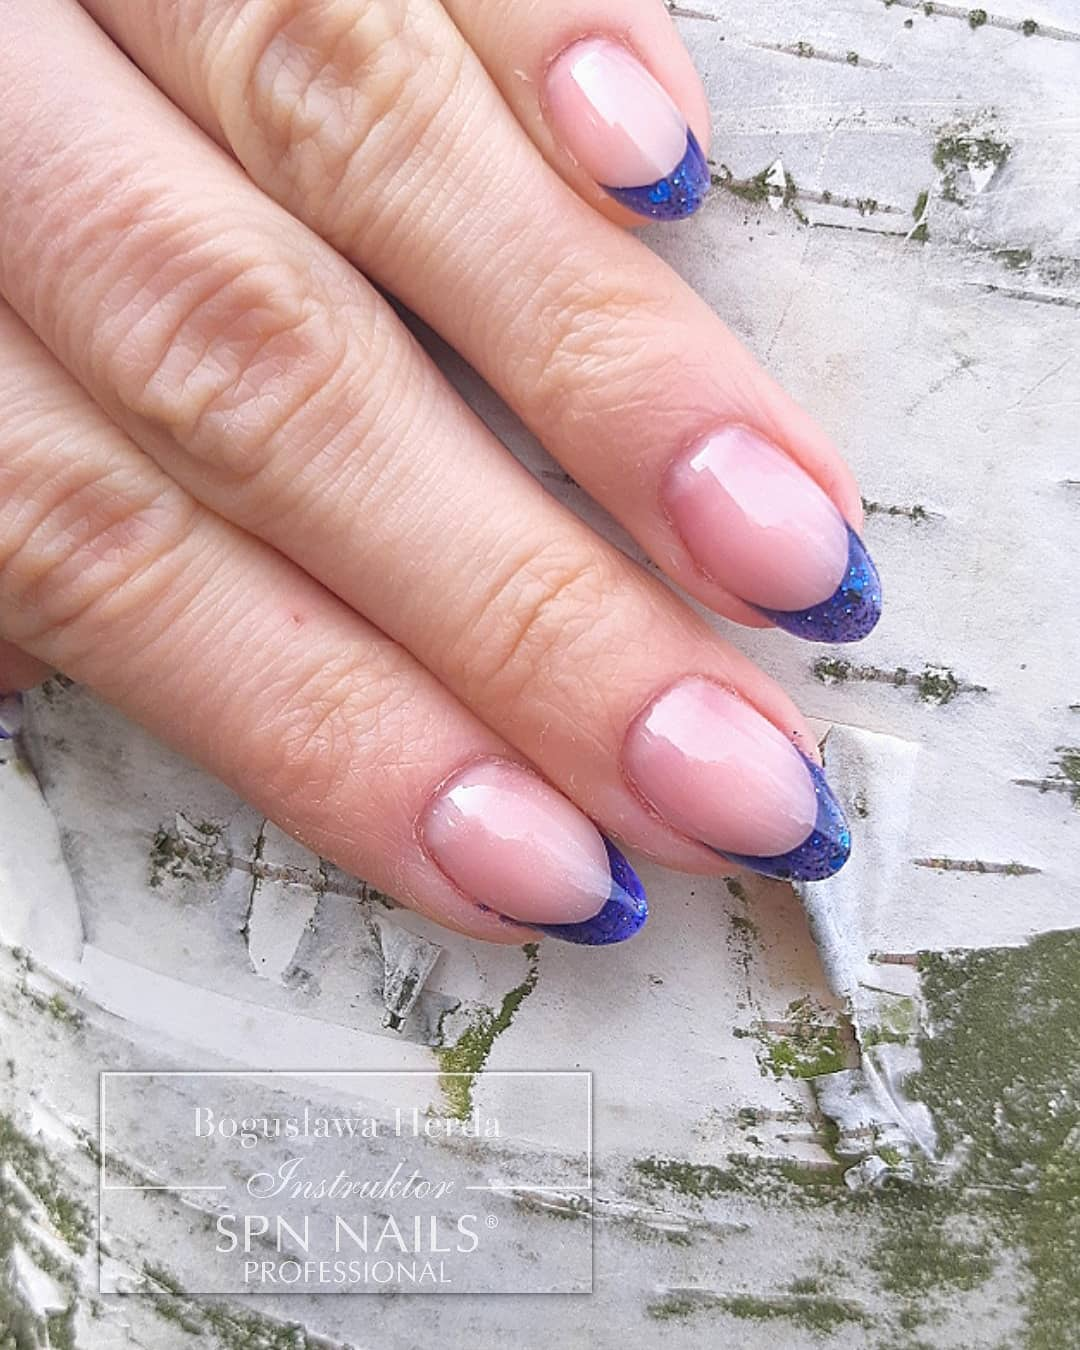 Bogusława Herda Permanentny Make-Up